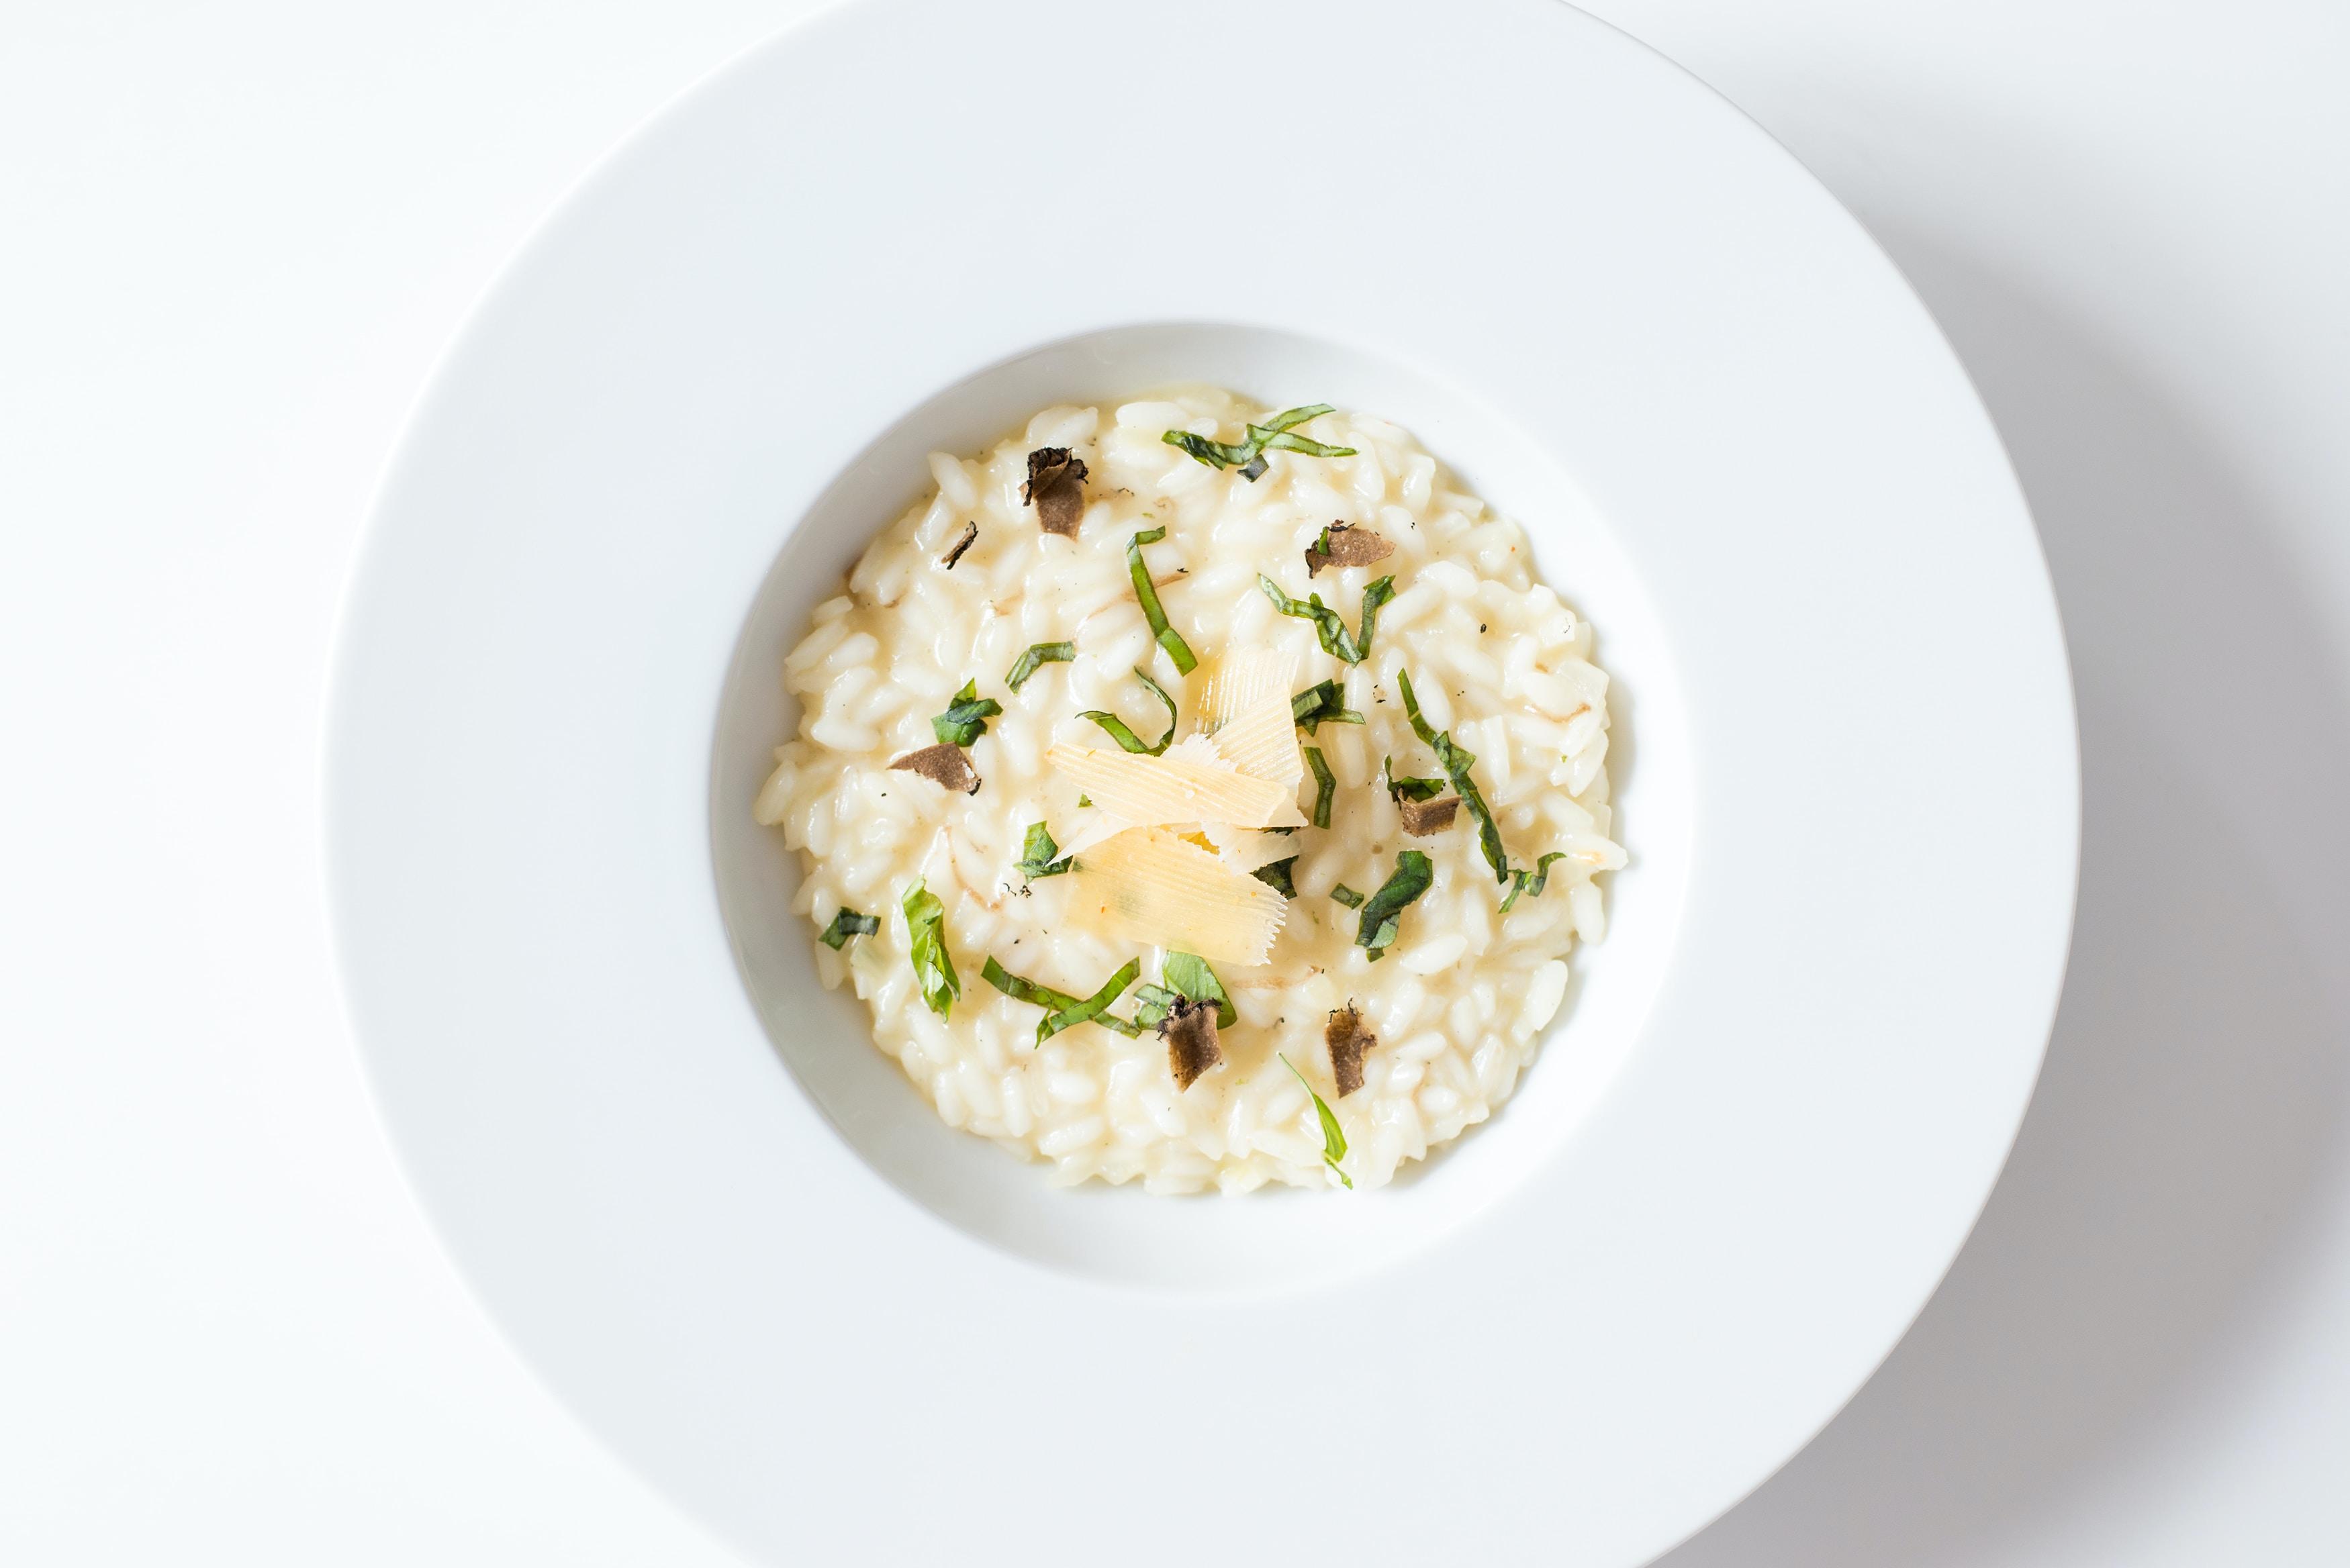 risotto on white ceramic plate